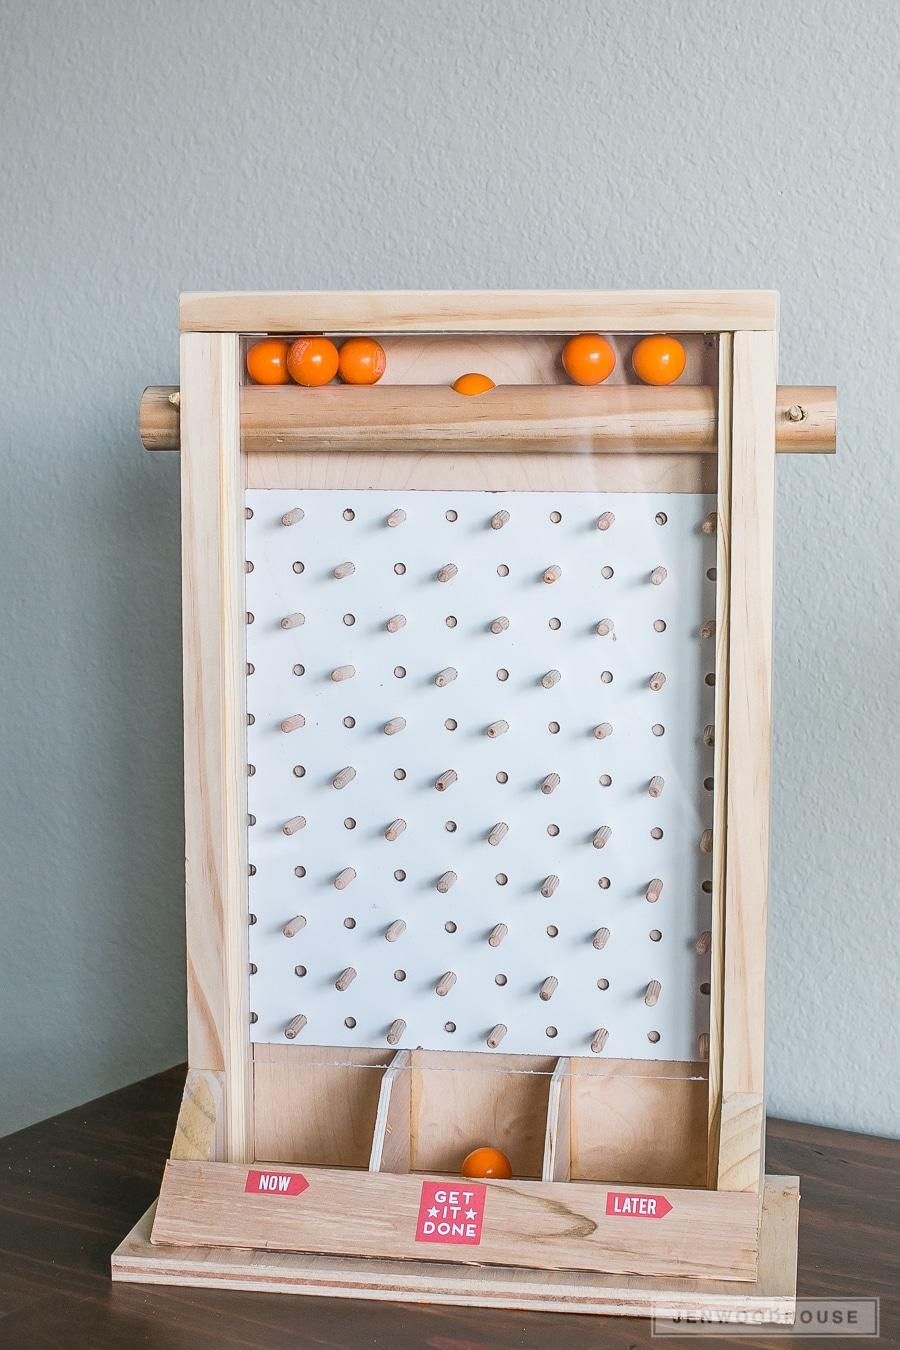 How to make a DIY plinko game candy dispenser